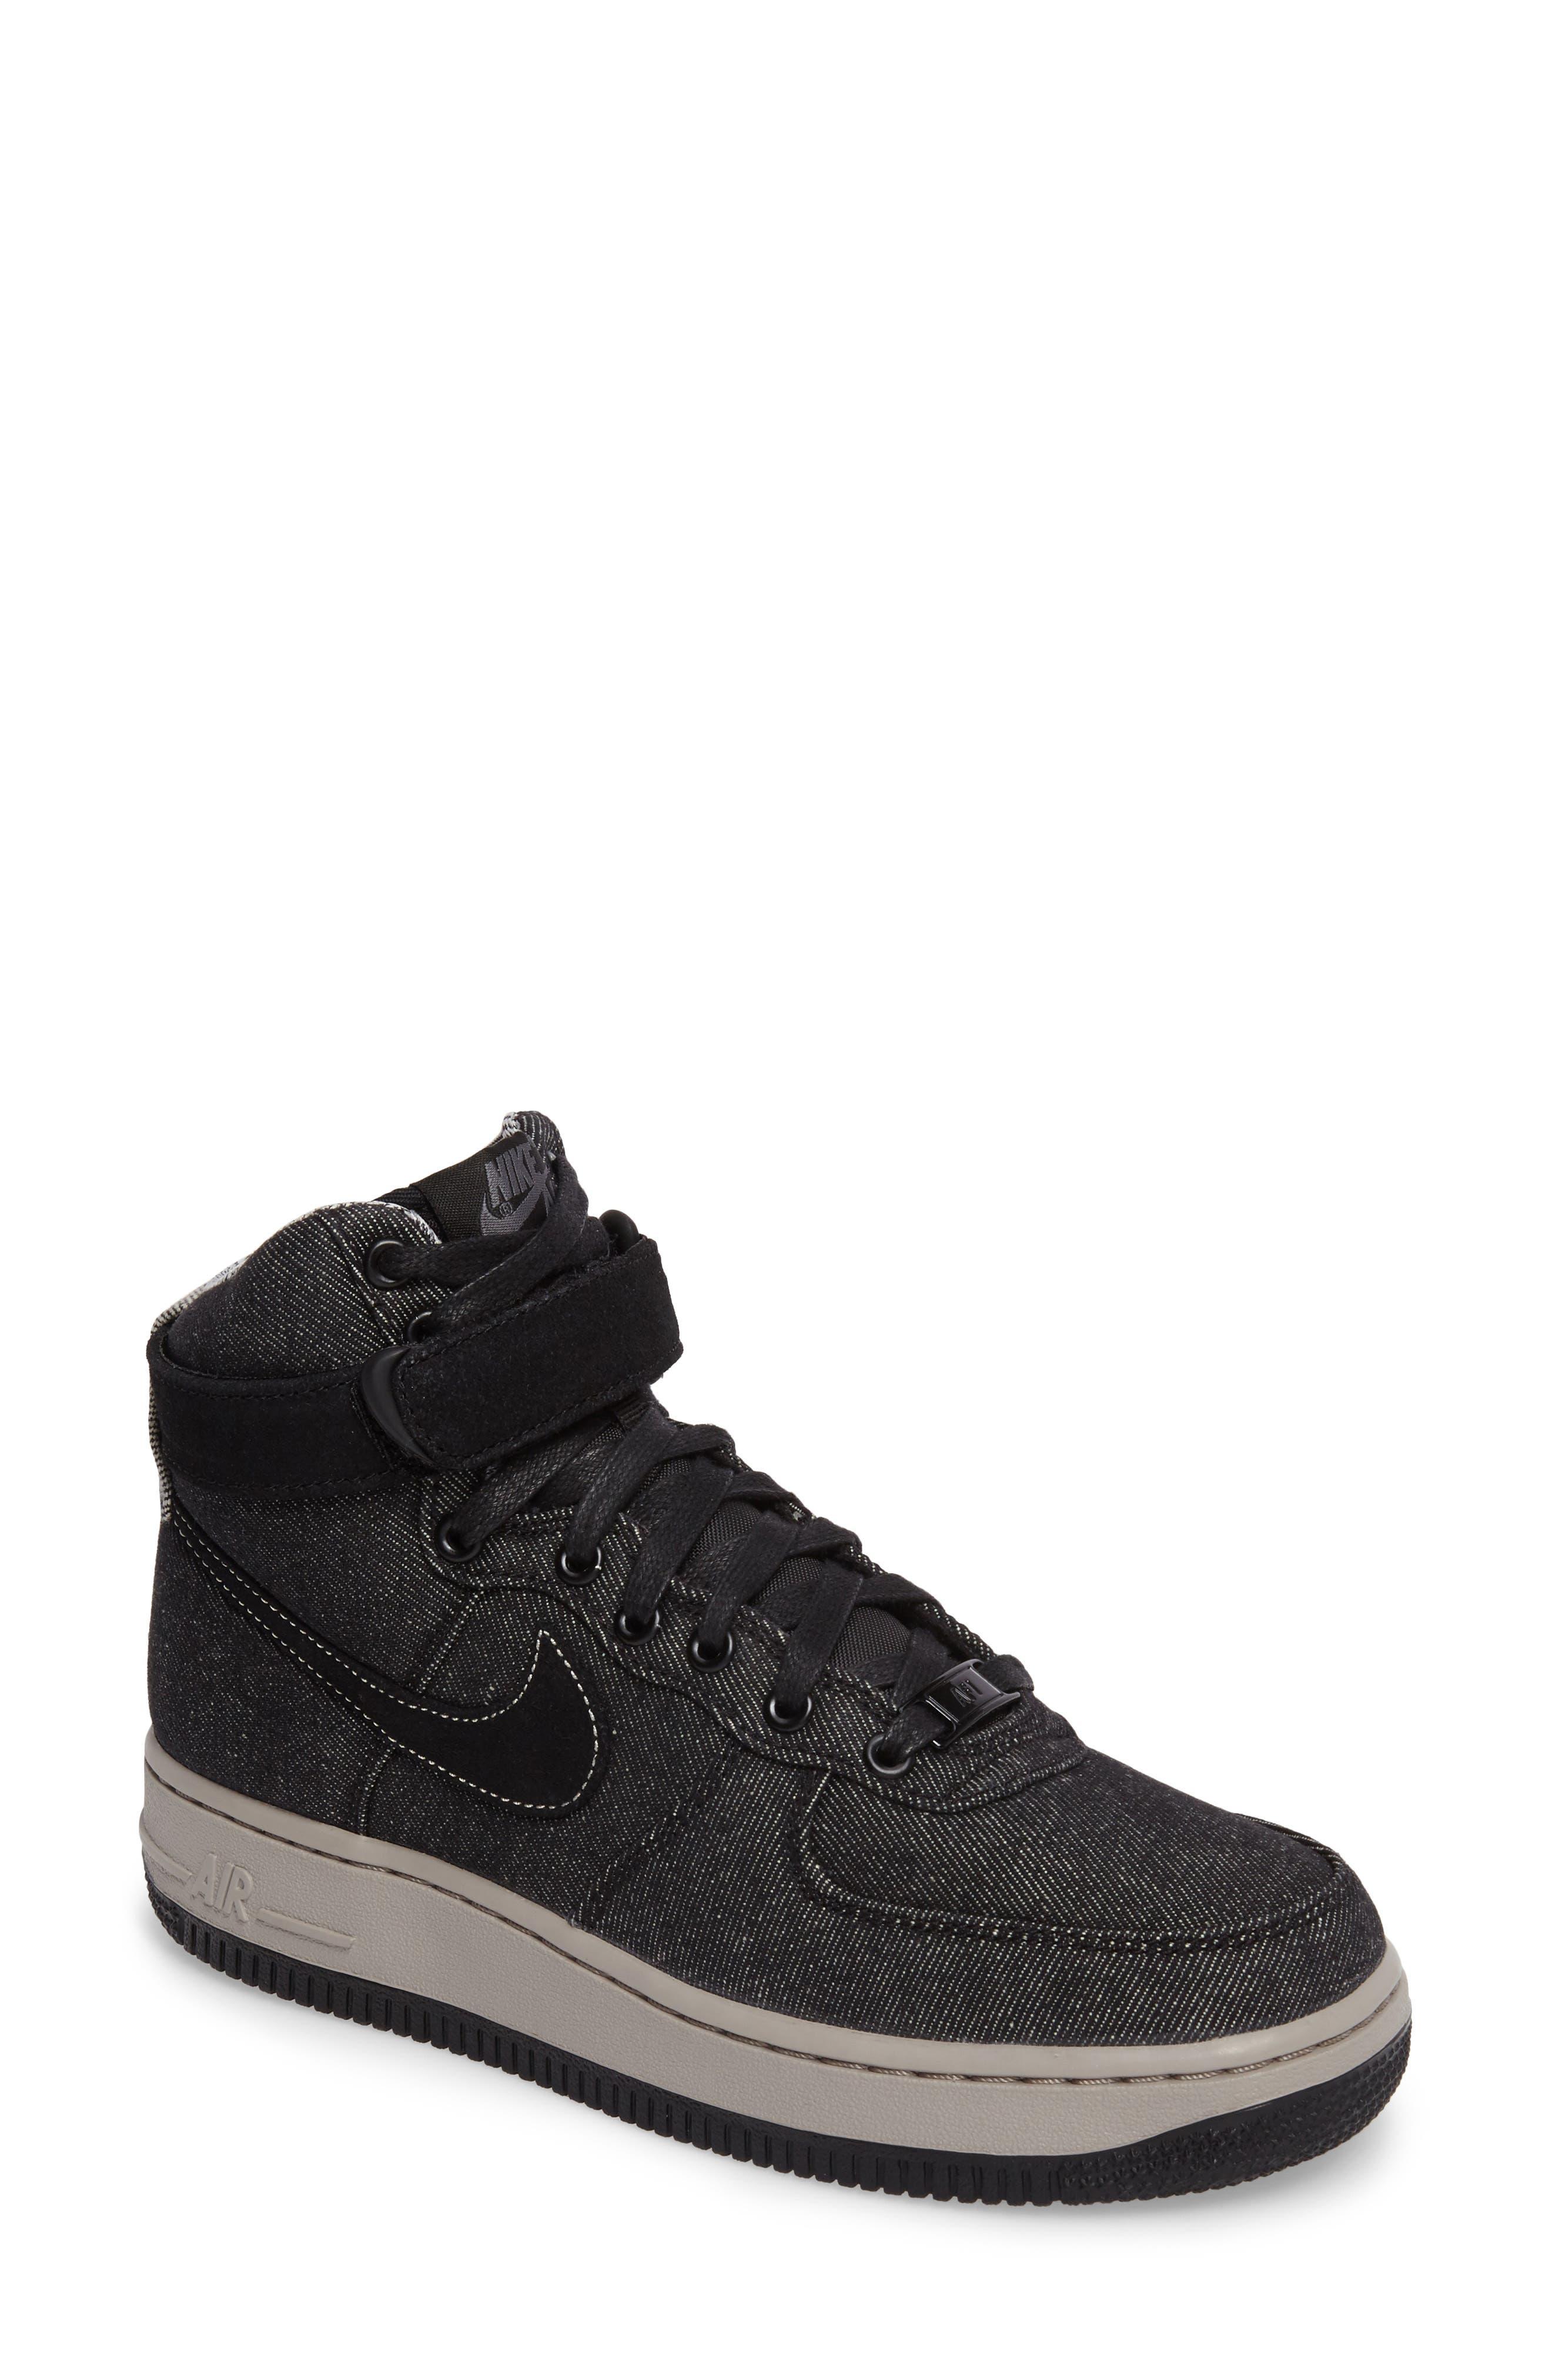 Main Image - Nike Air Force 1 High Top SE Sneaker (Women)